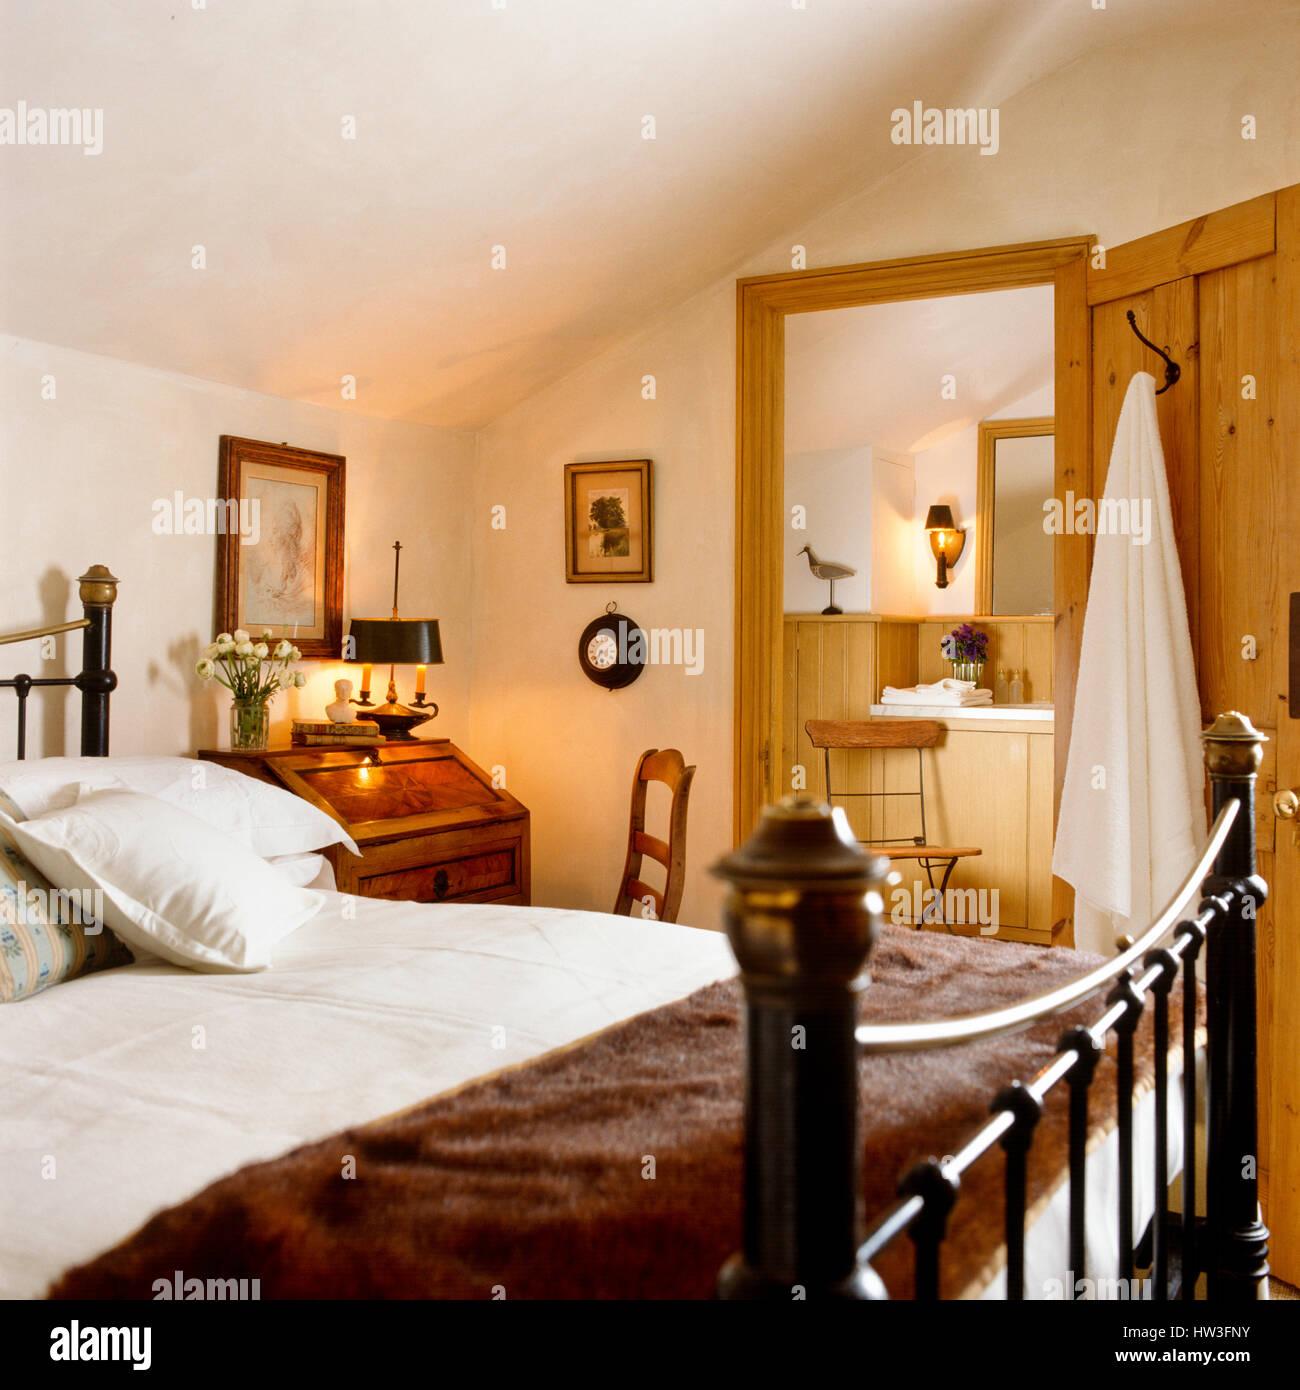 Rustikale Schlafzimmer Stockfoto, Bild: 135917207 - Alamy